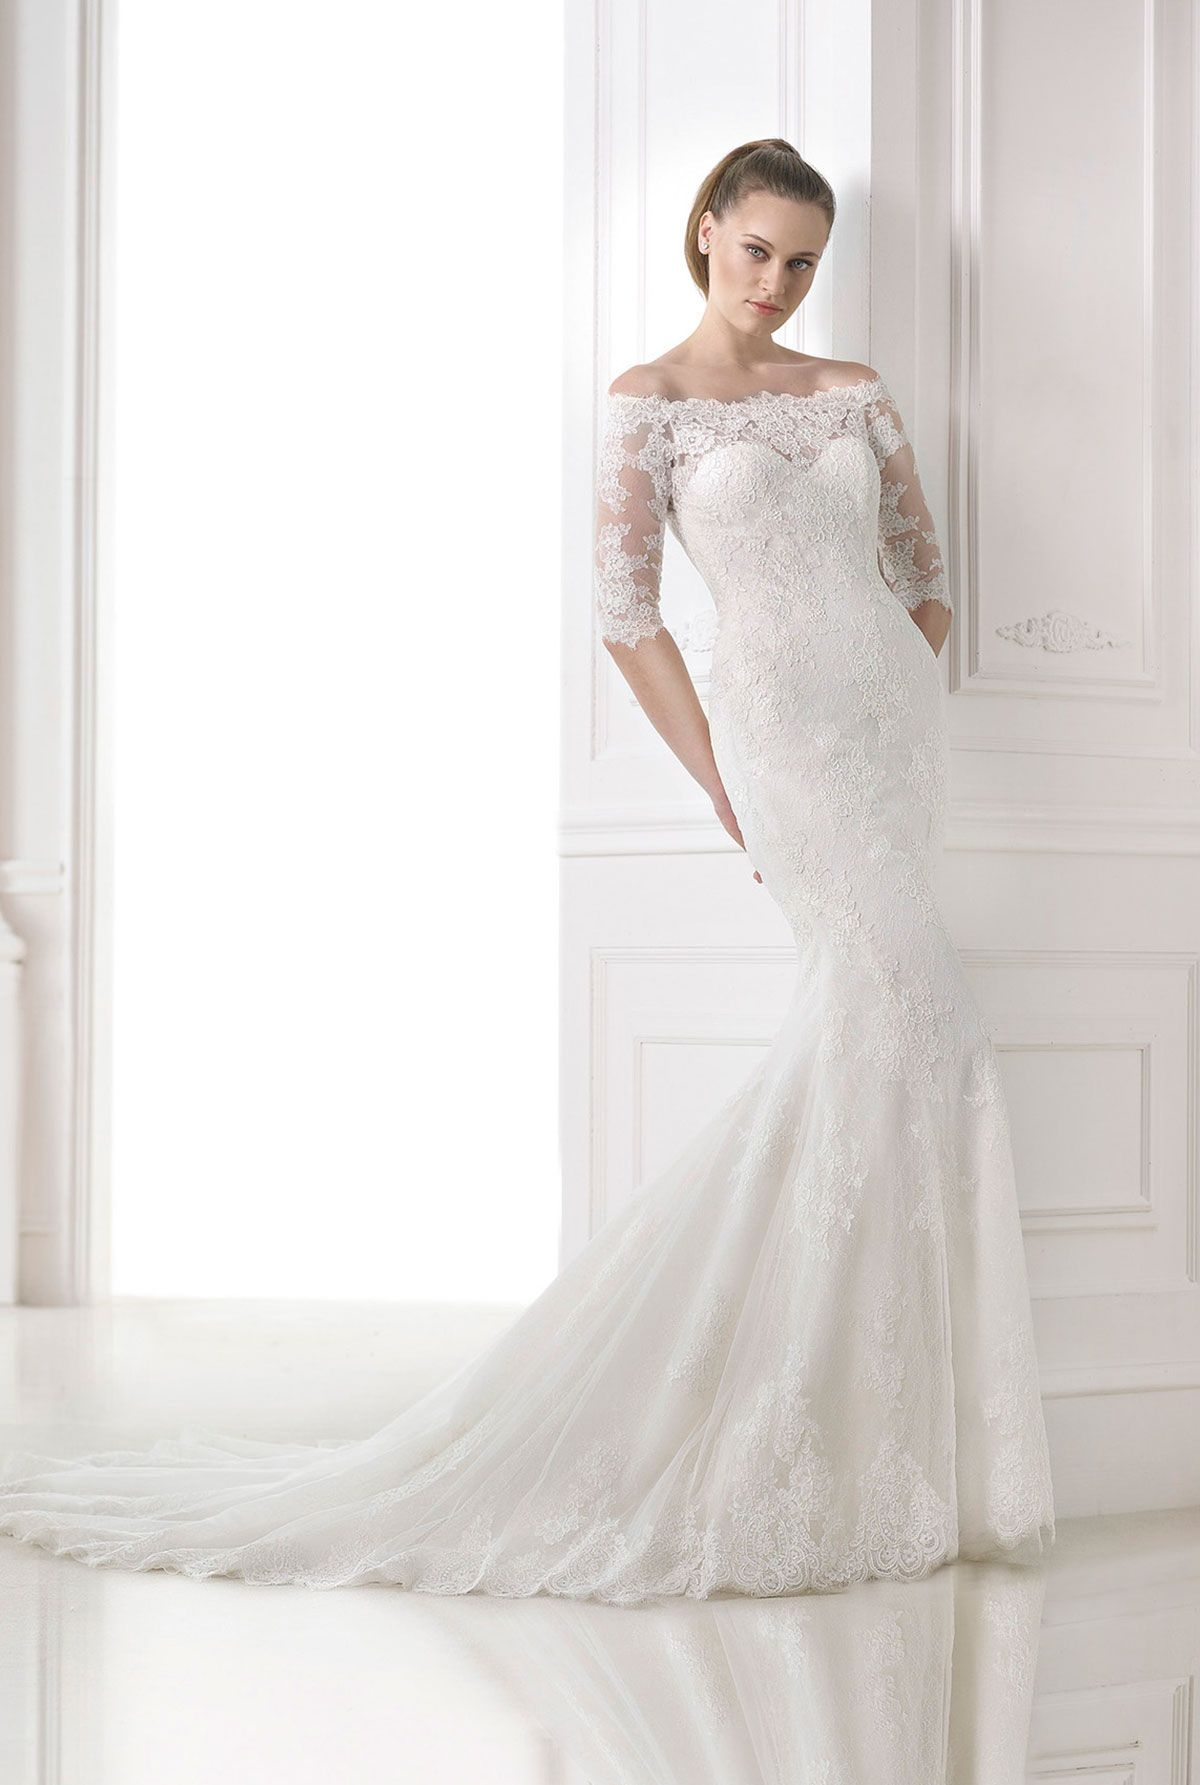 Pronovias - Mandara. | Wedding Ideas | Pinterest | Wedding dress ...